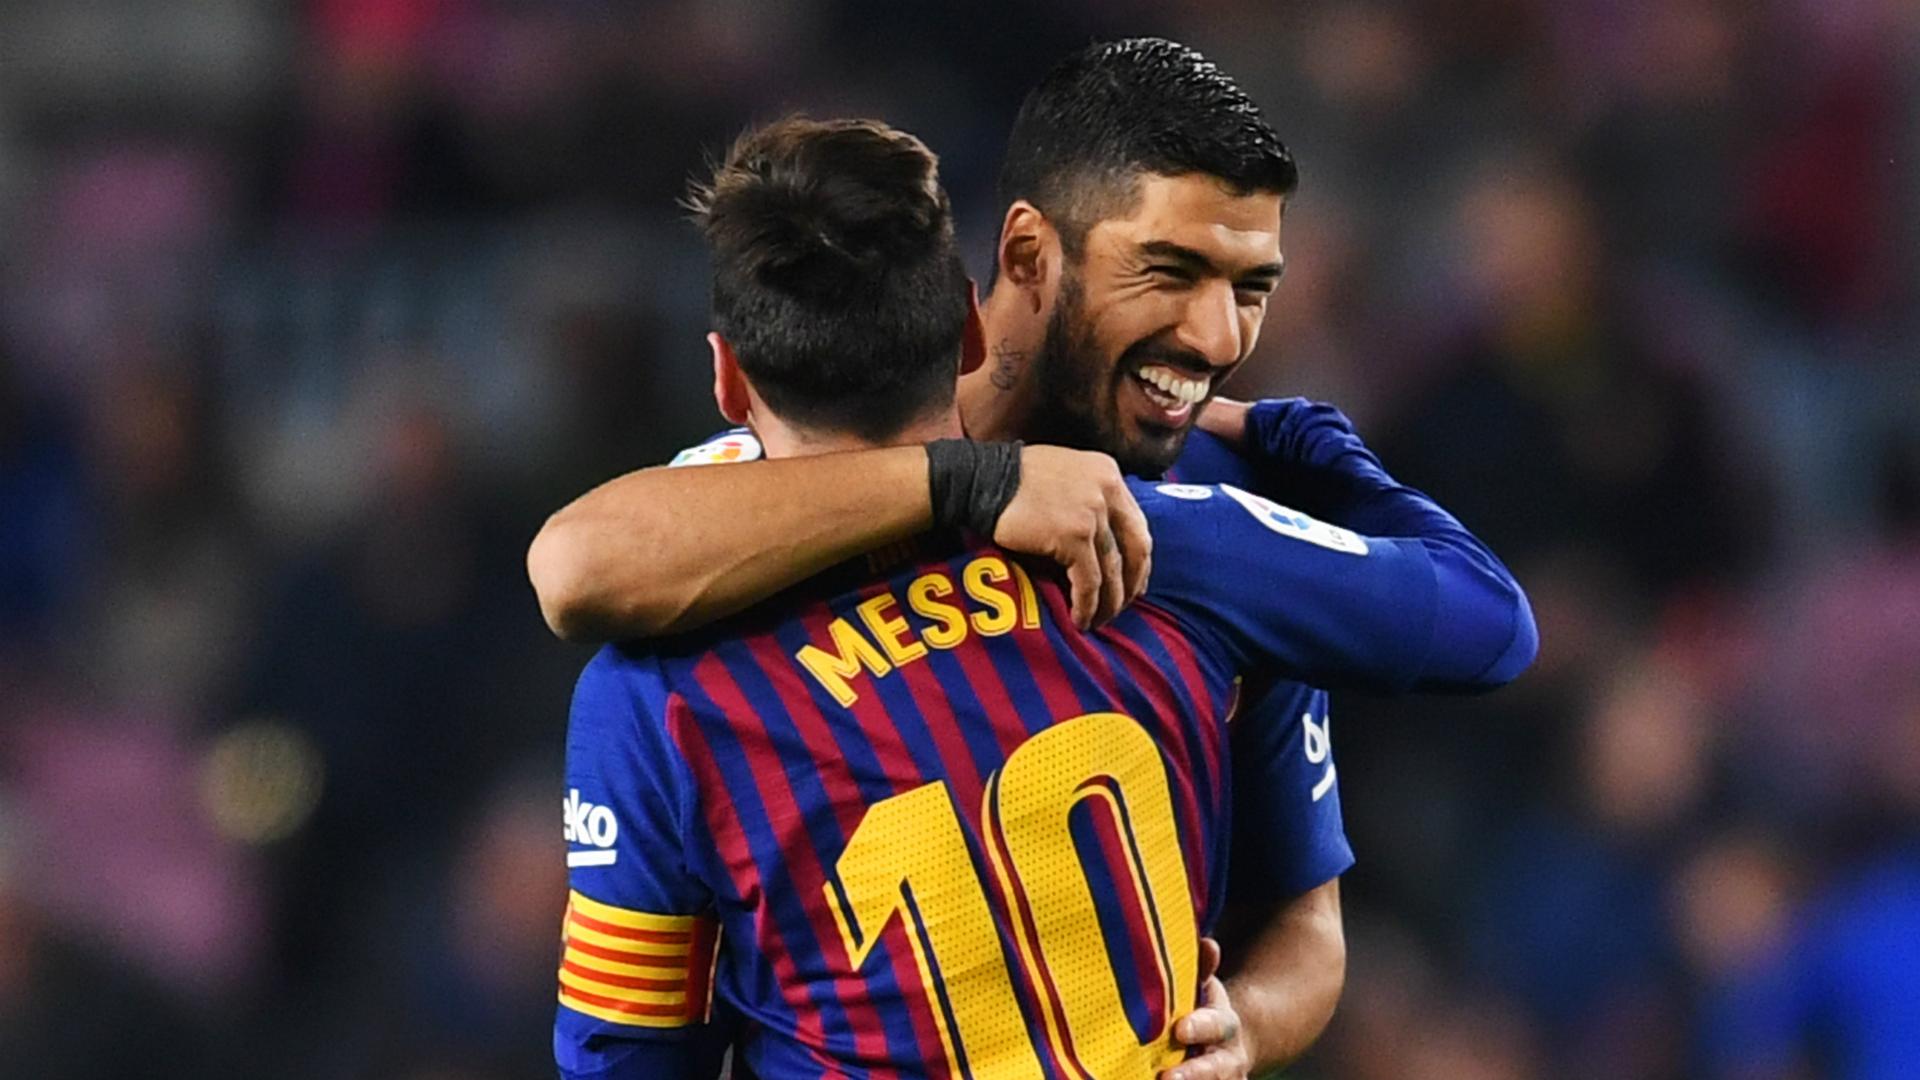 Messi's apparent retirement hint was misunderstood – Suarez